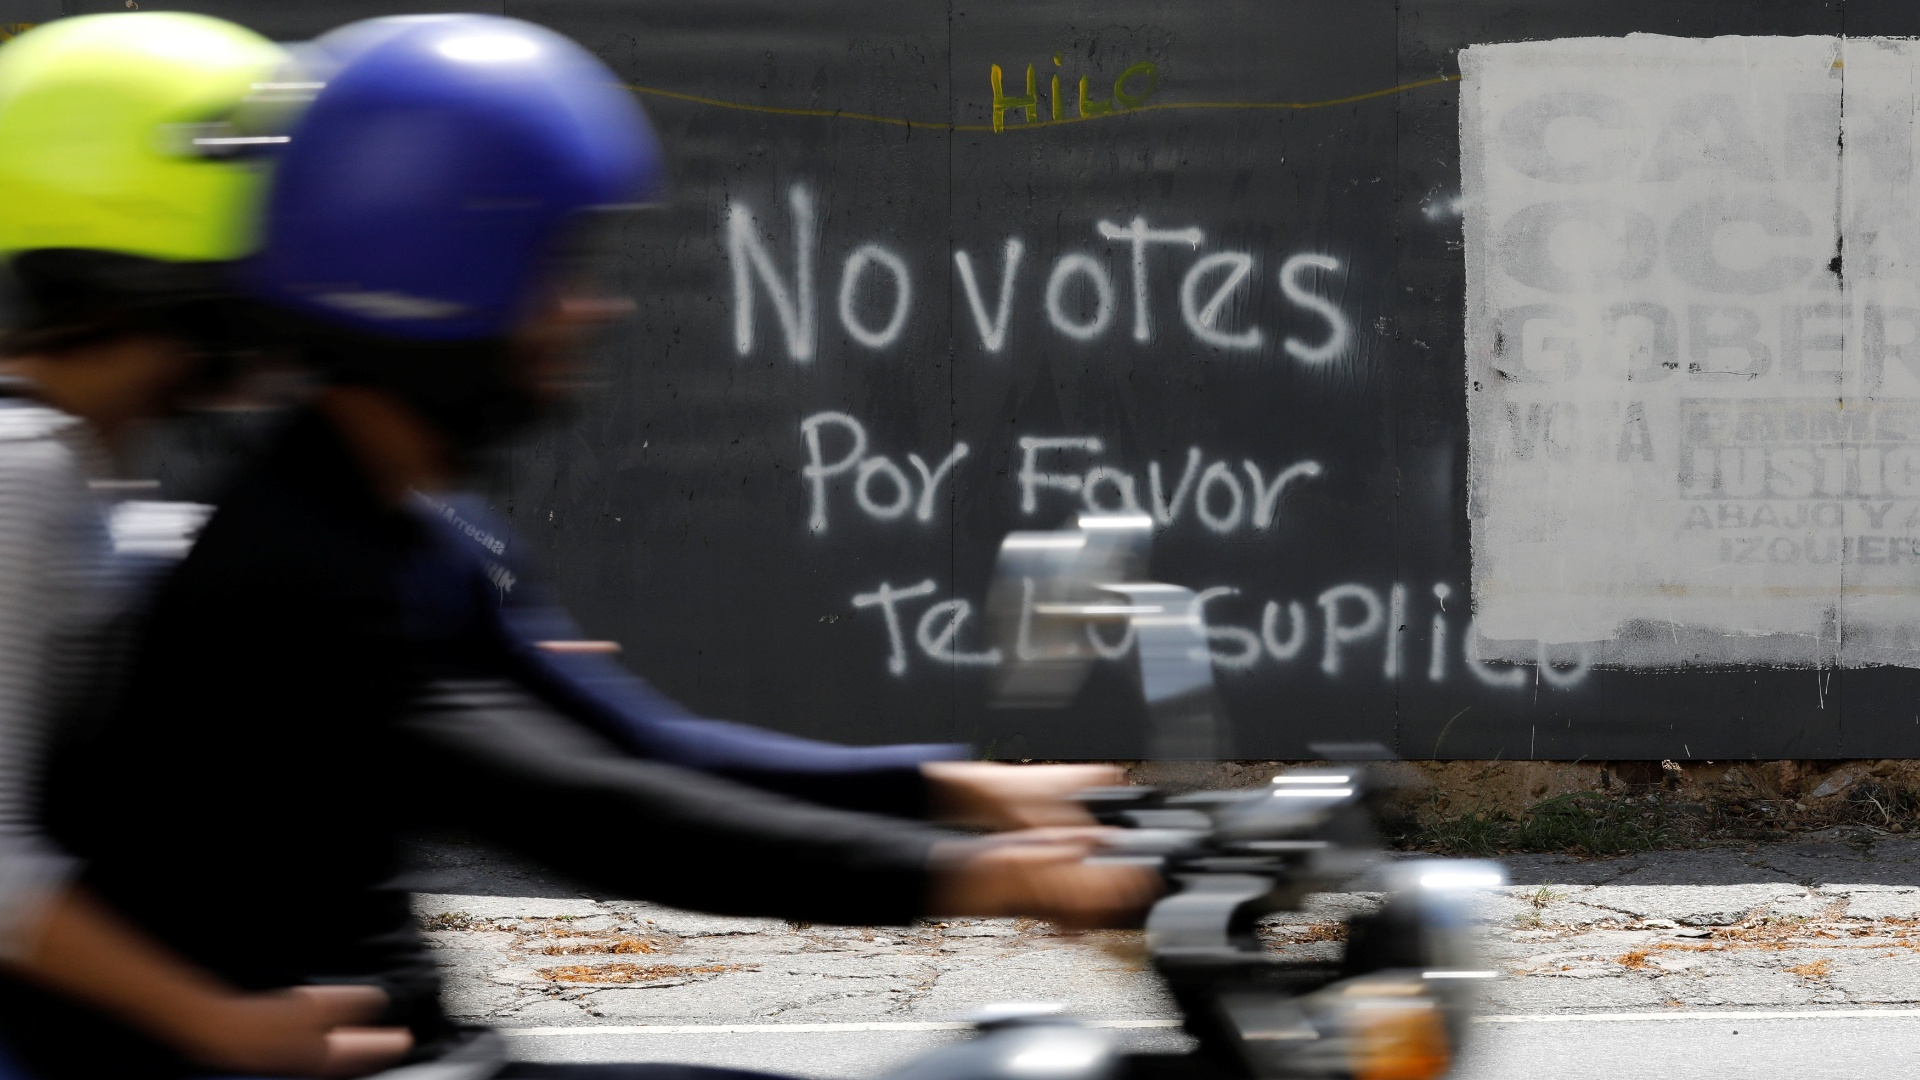 Carlos Jasso/Reuters